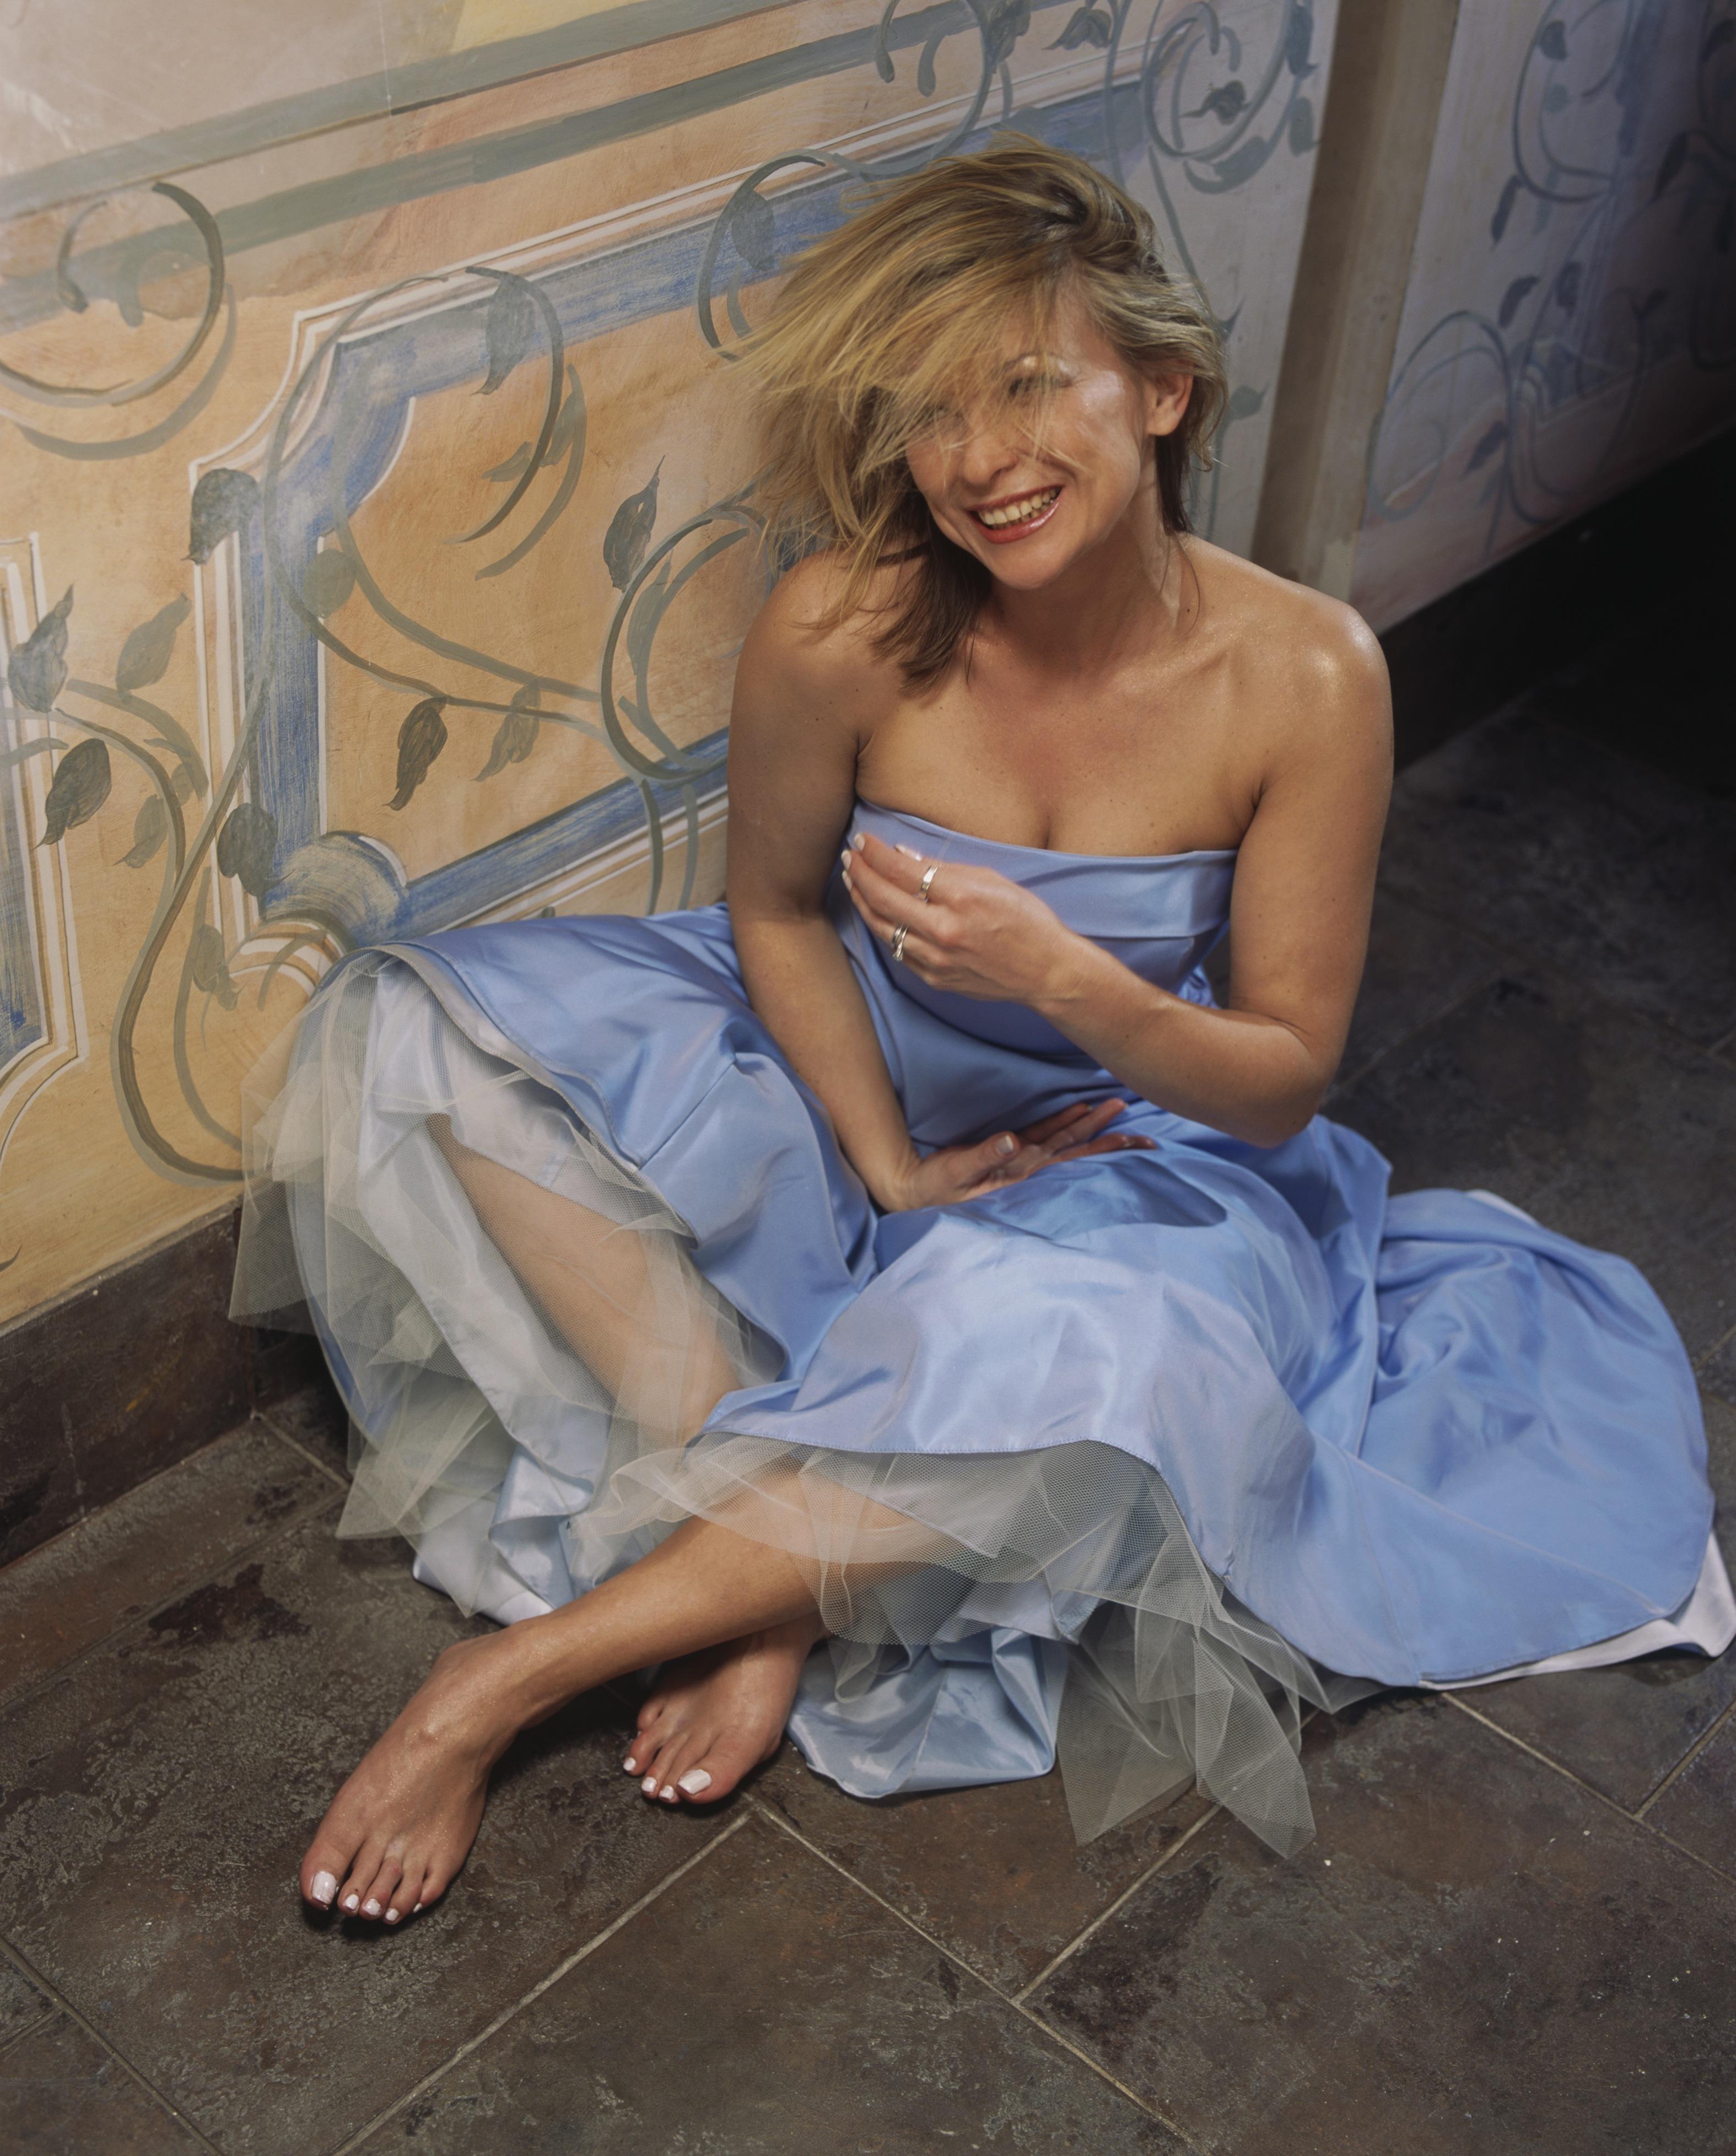 claire king's feet << wikifeet